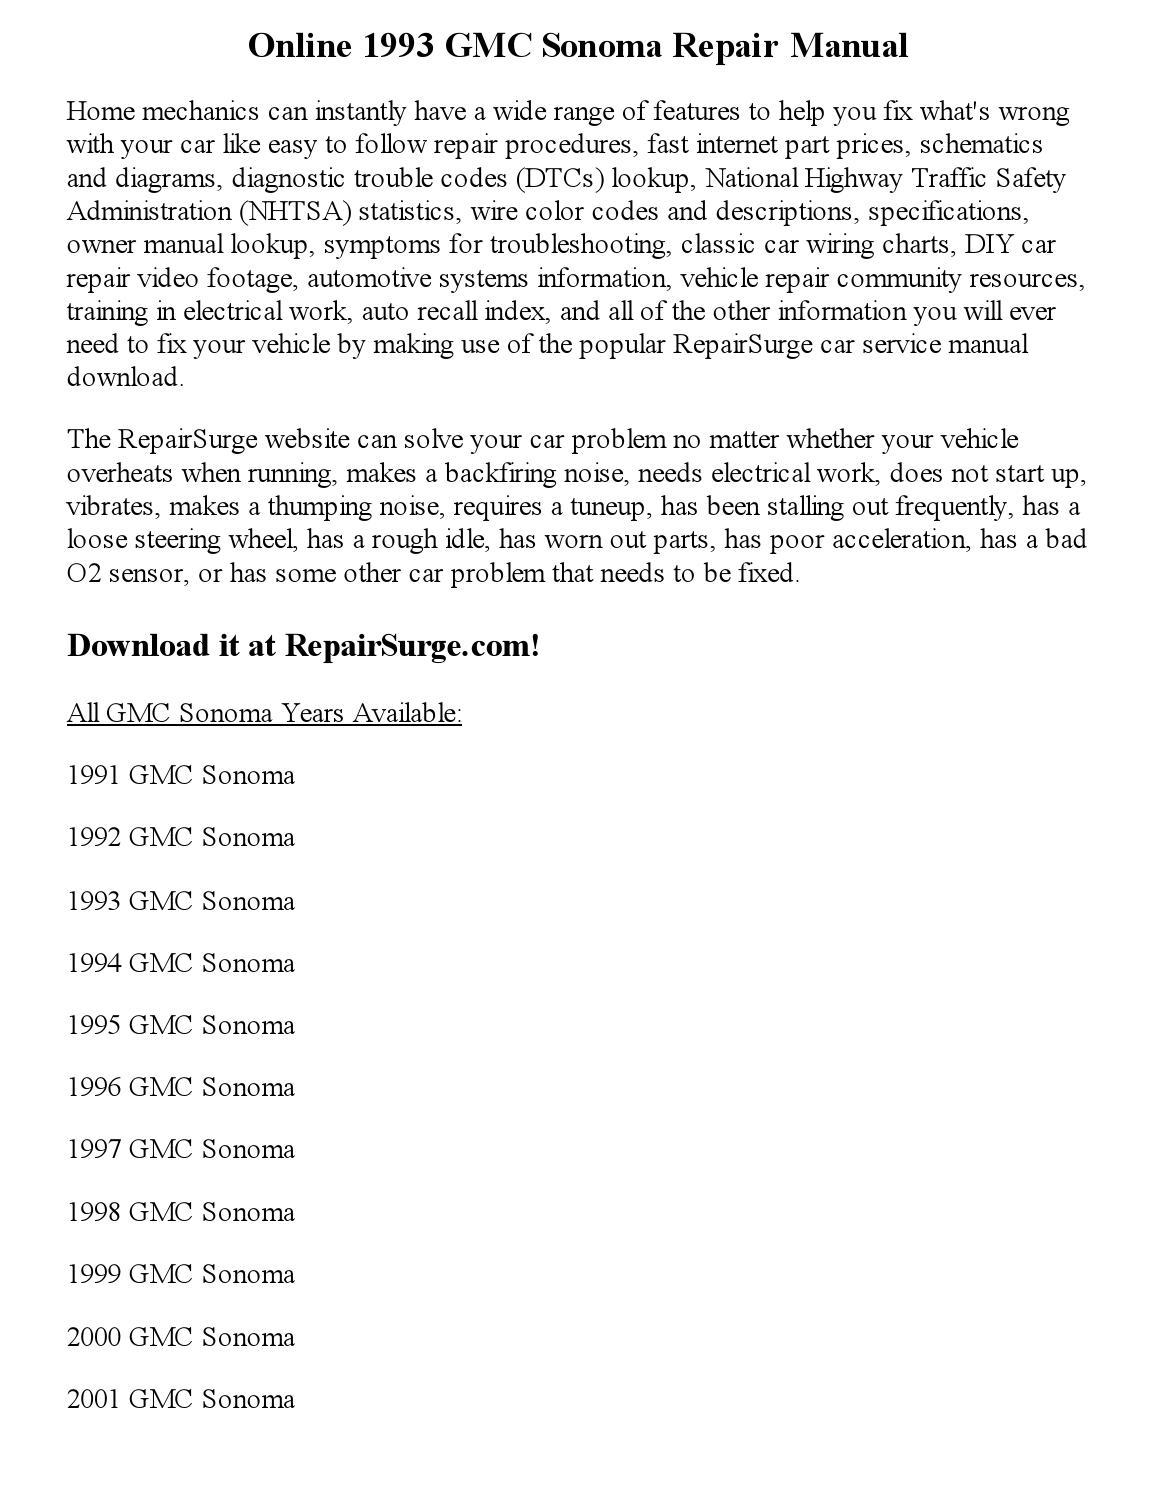 1993 gmc sonoma repair manual online by jackson paul issuu